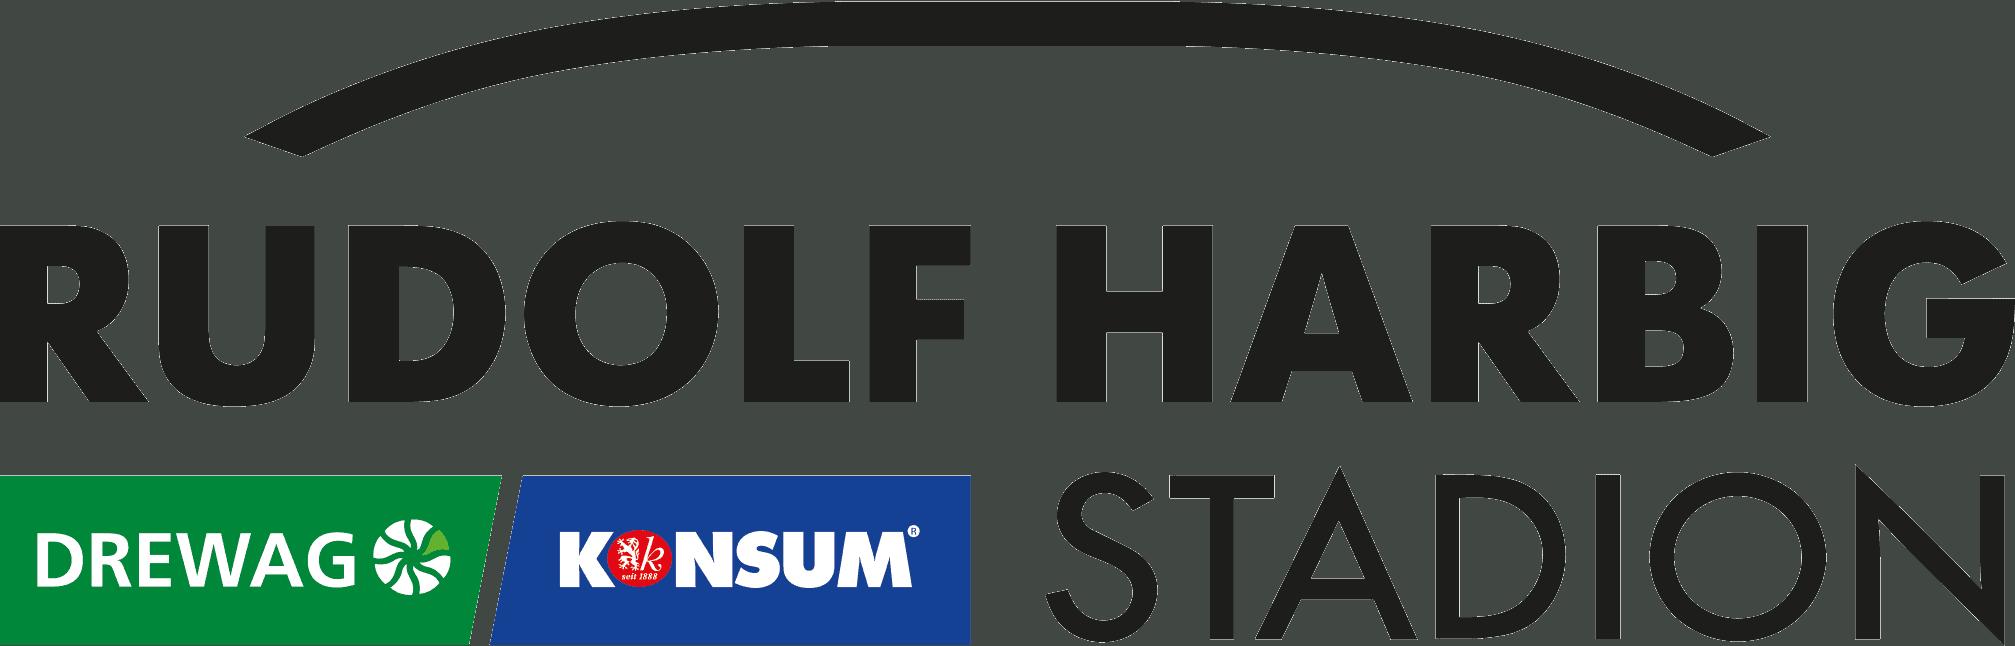 Rudolf Harbig Stadion Logo